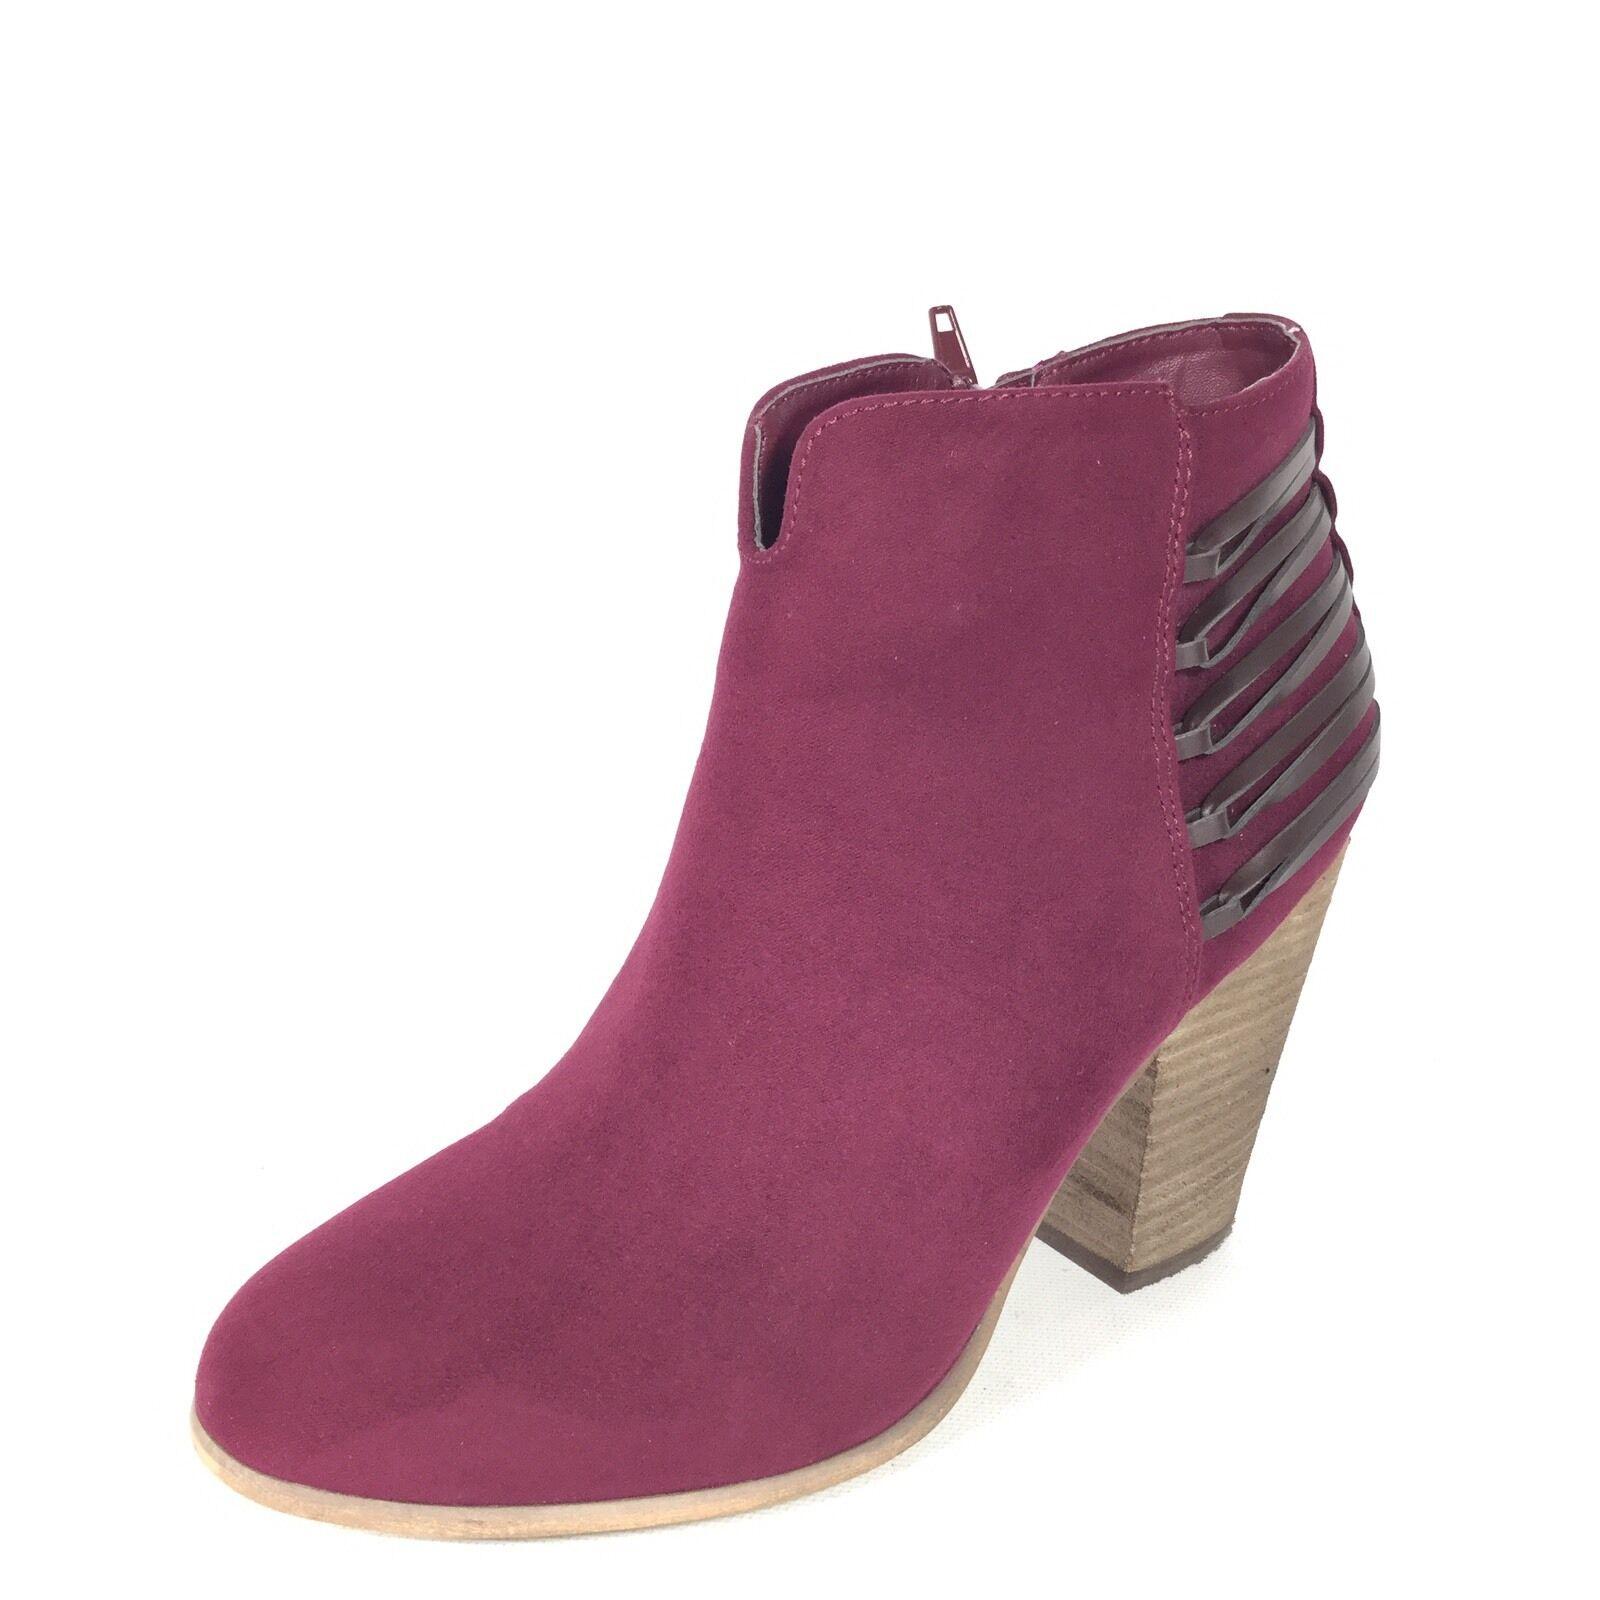 Carlos By Carlos Santana Hawkins Women's Size 7.5 M Burgundy Heel Ankle Boots.